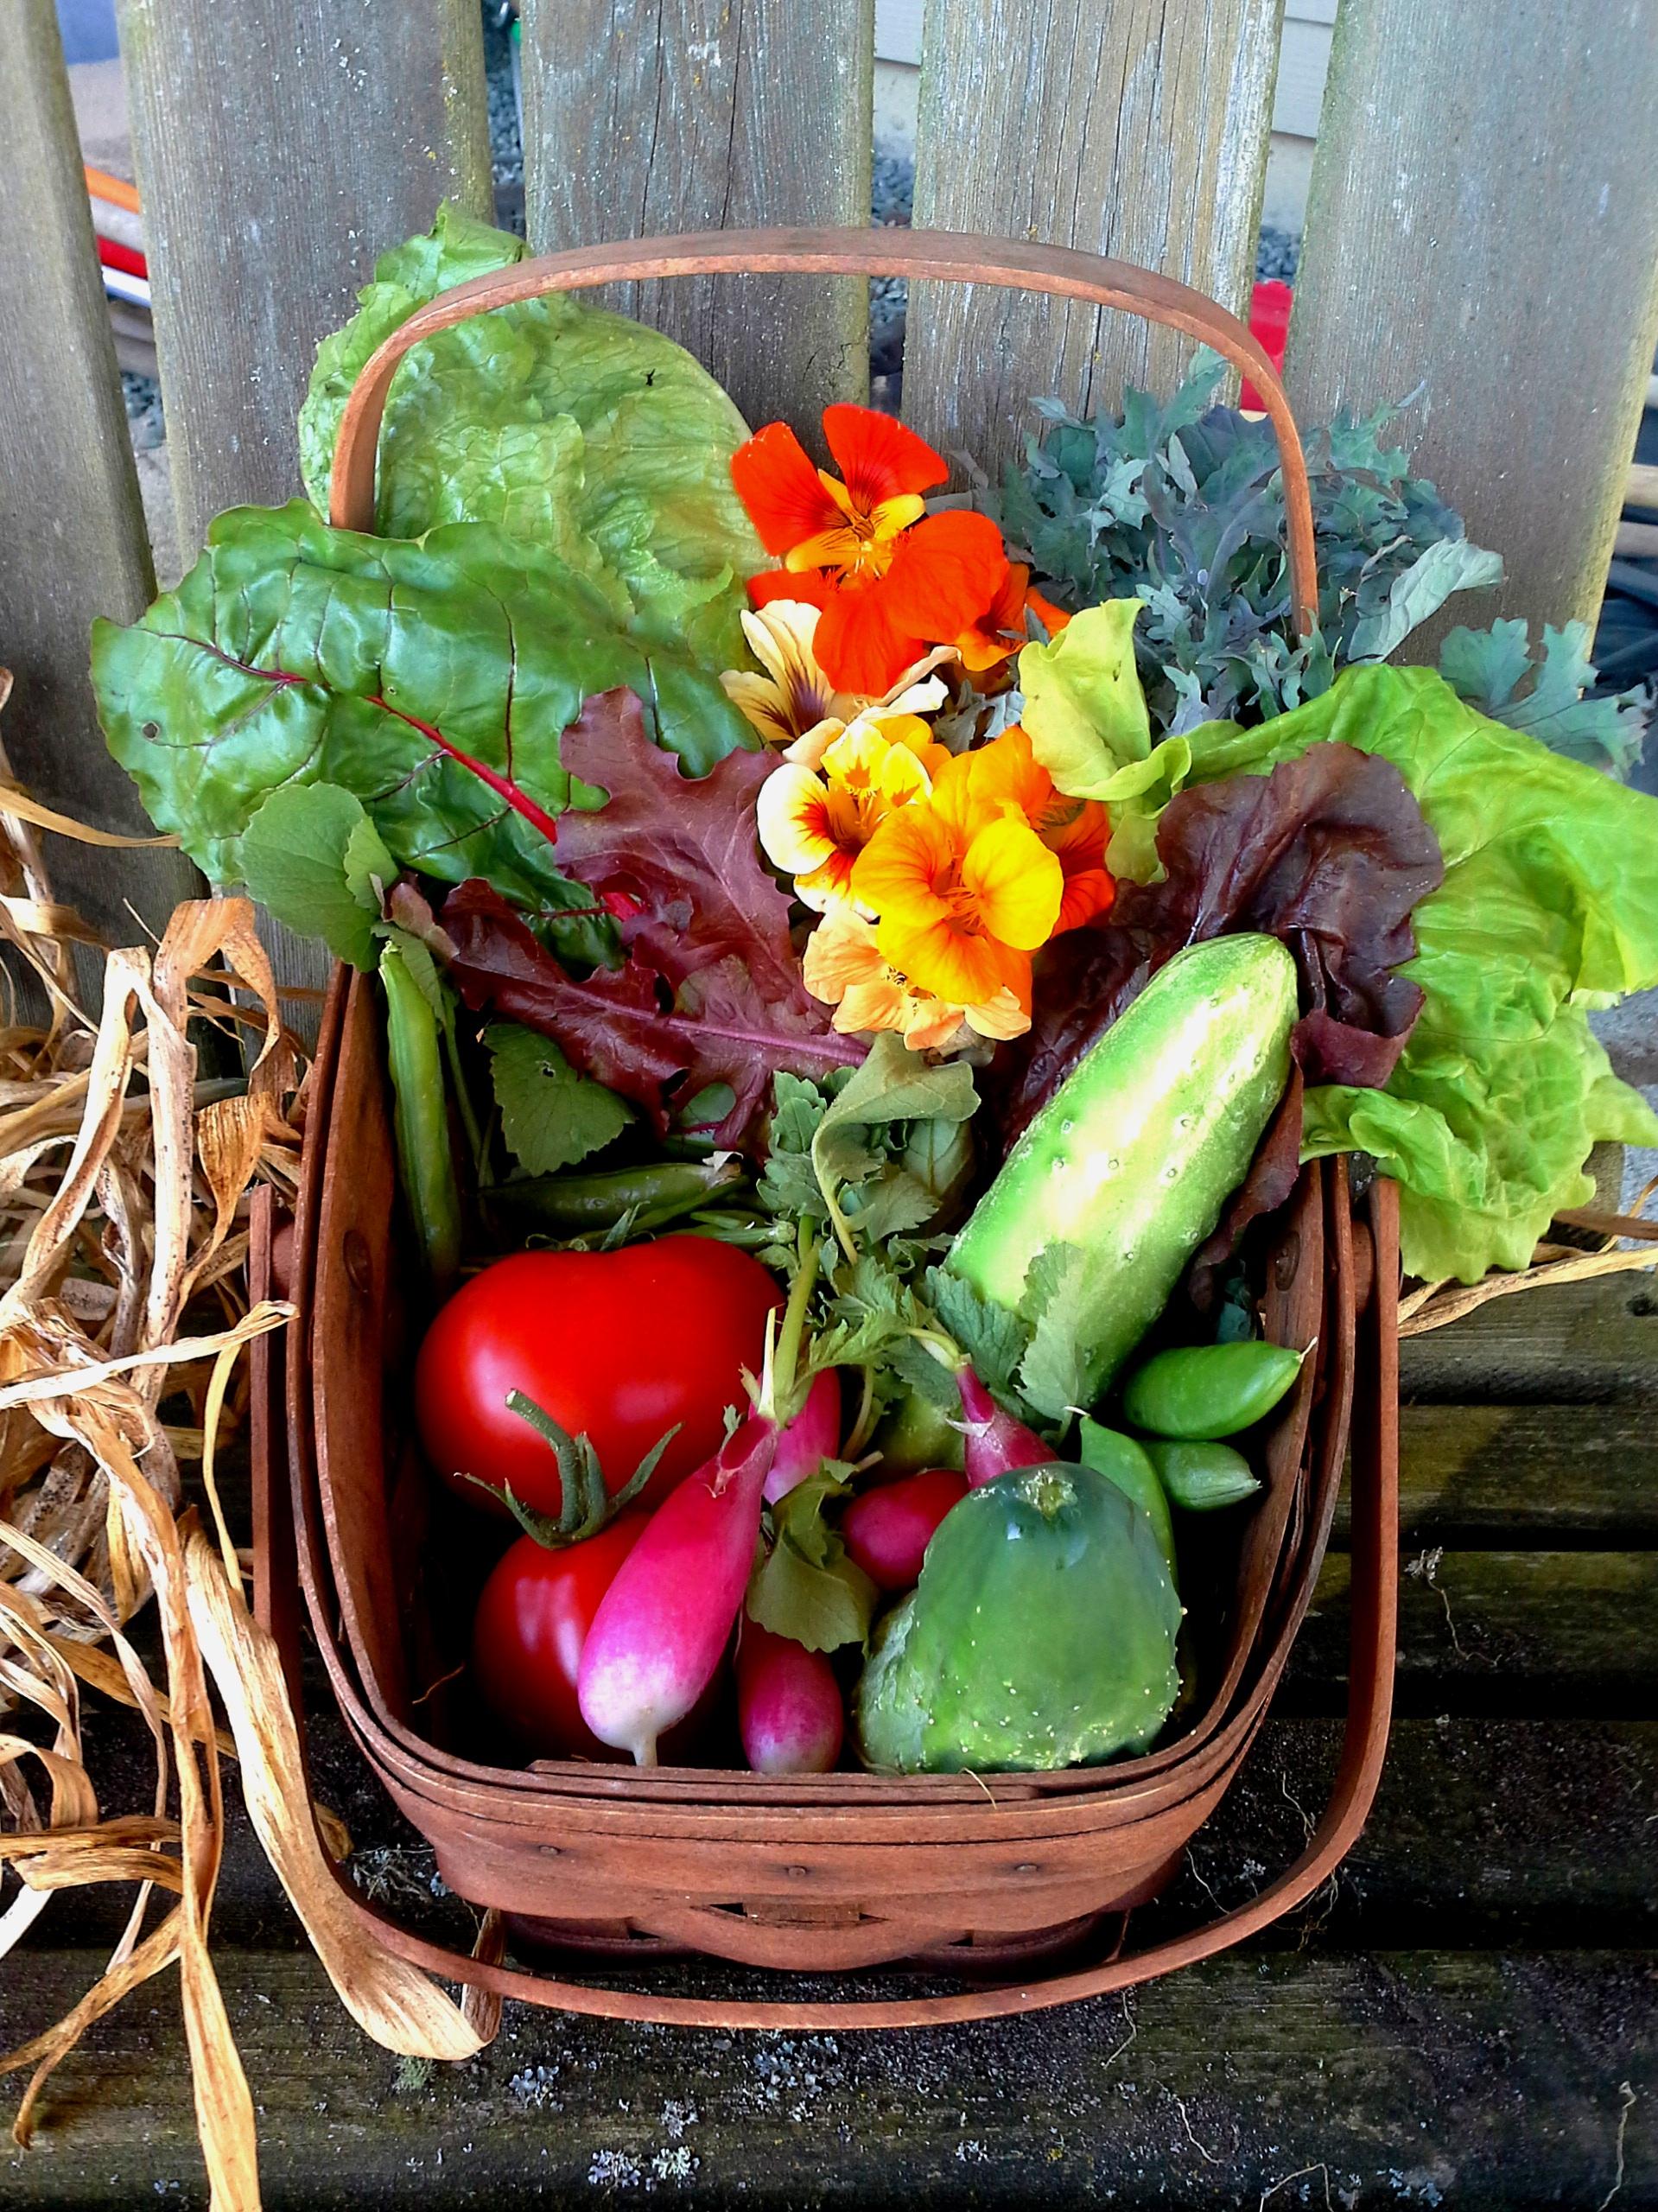 My summer gathering basket.